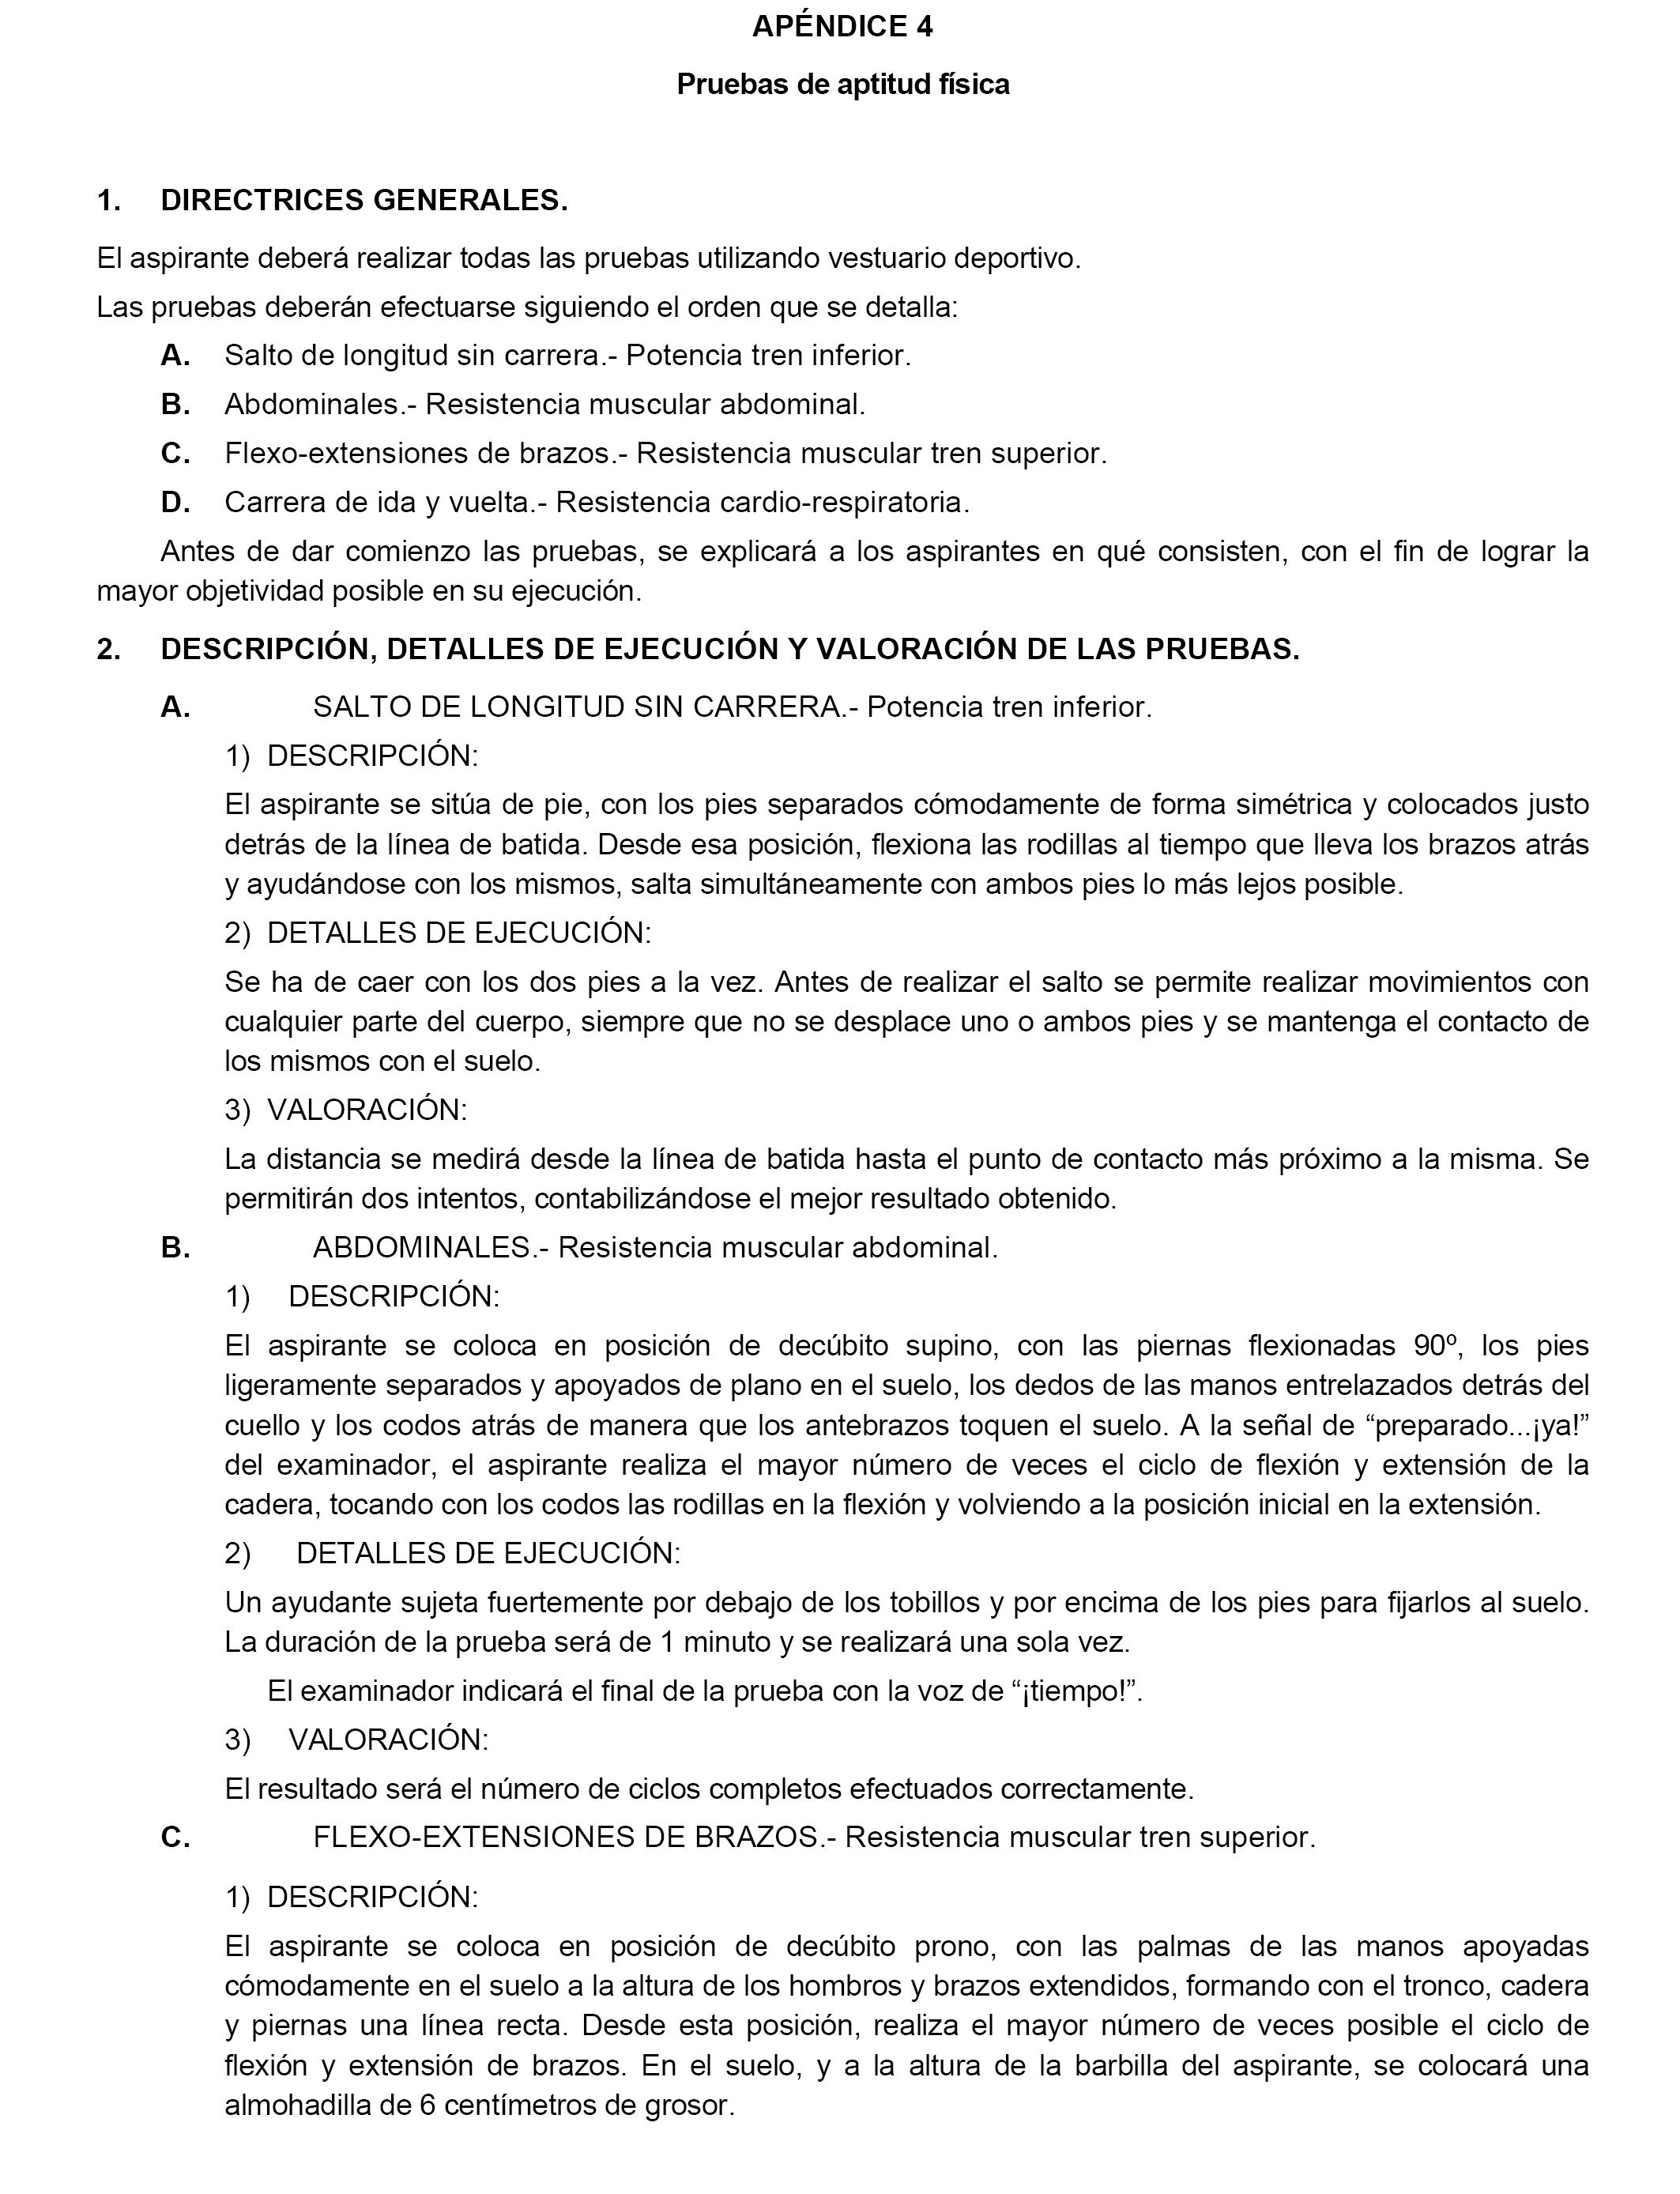 BOE.es - Documento BOE-A-2017-3007